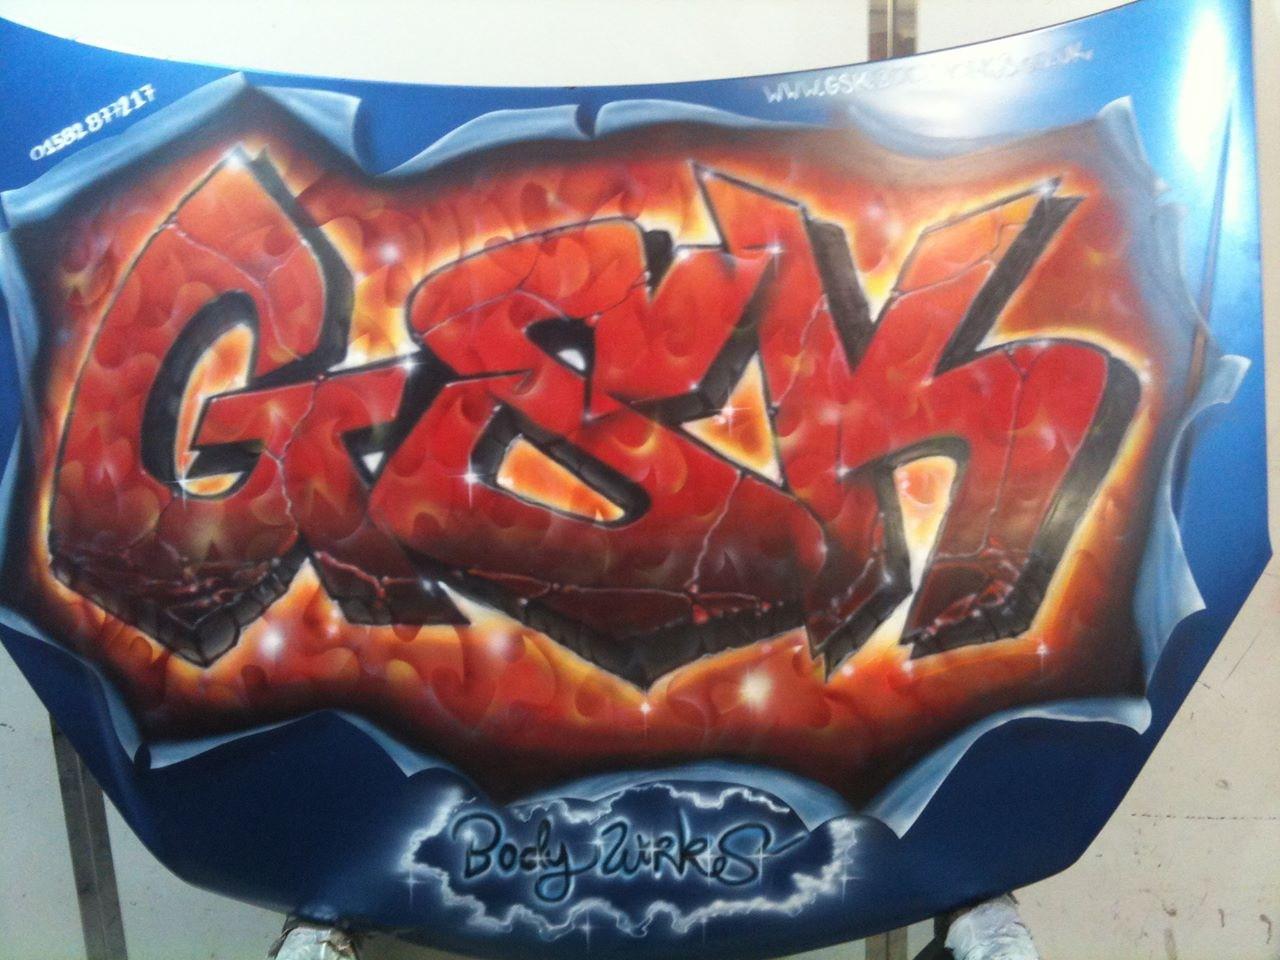 Airbrushed Graffiti Artwork on Car Bonnet